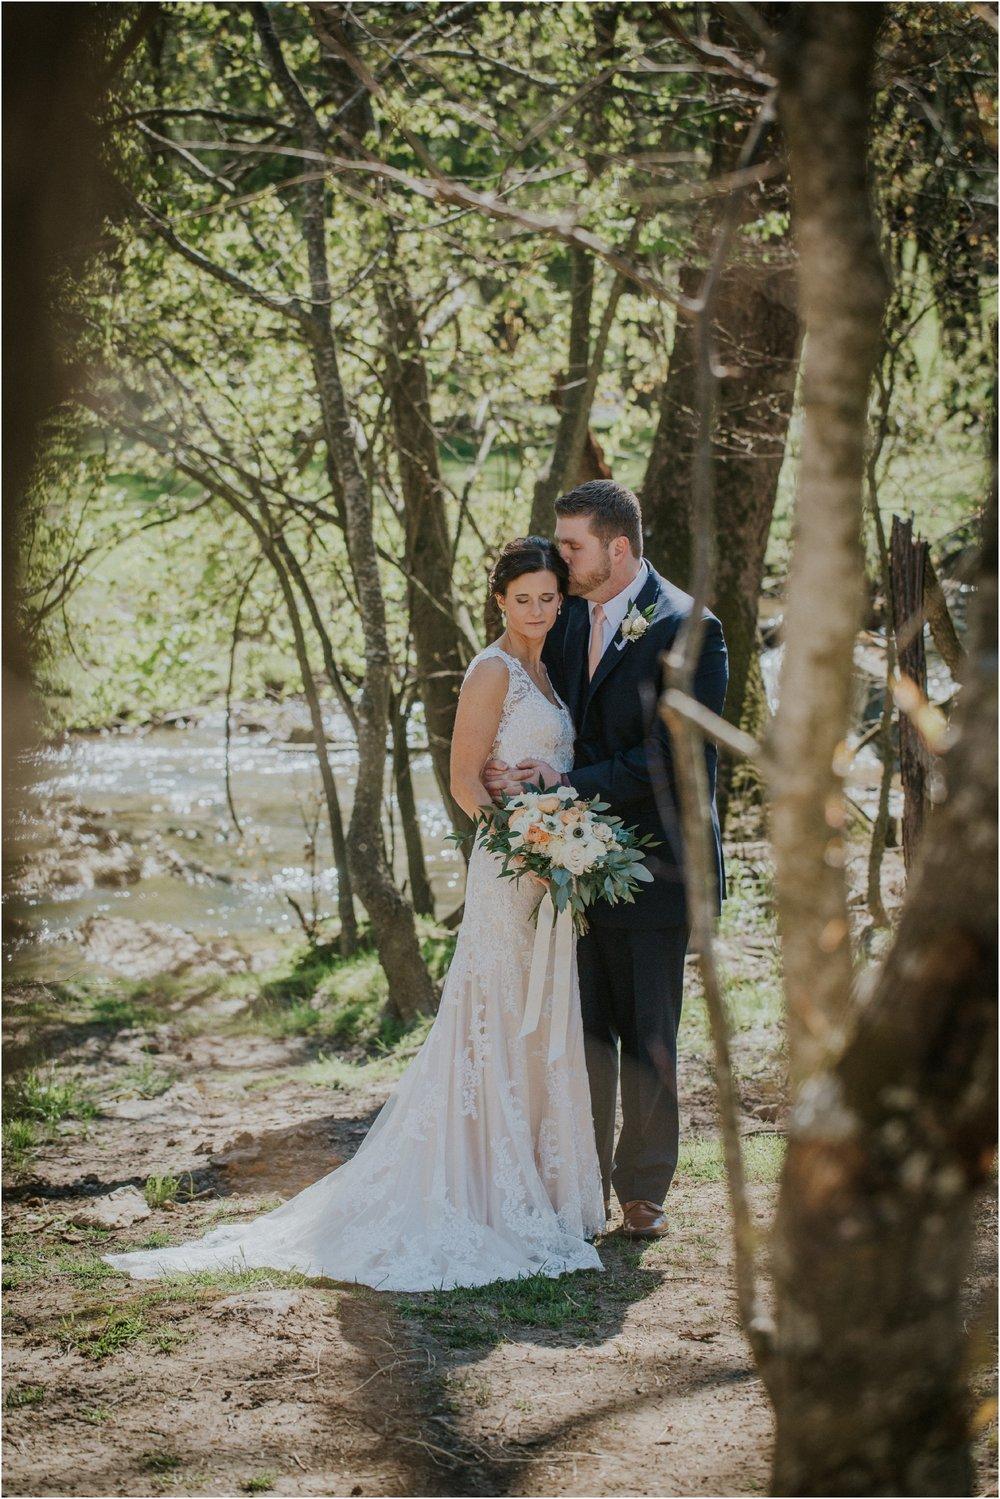 millstone-limestone-tn-tennessee-rustic-outdoors-pastel-lodge-cabin-venue-wedding-katy-sergent-photographer_0062.jpg